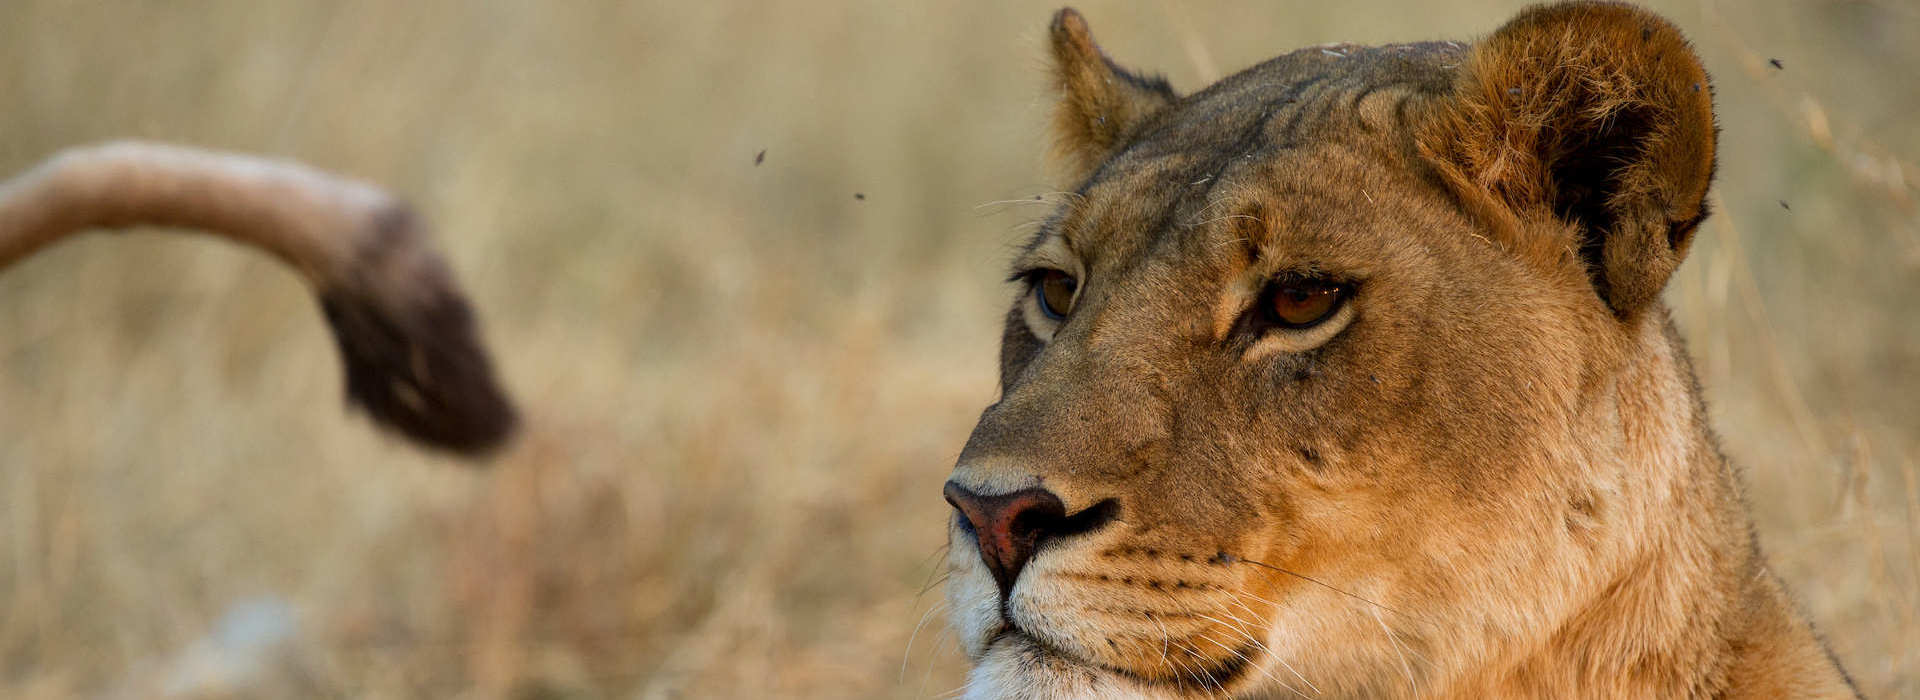 Lioness-botswana2-2018-prod